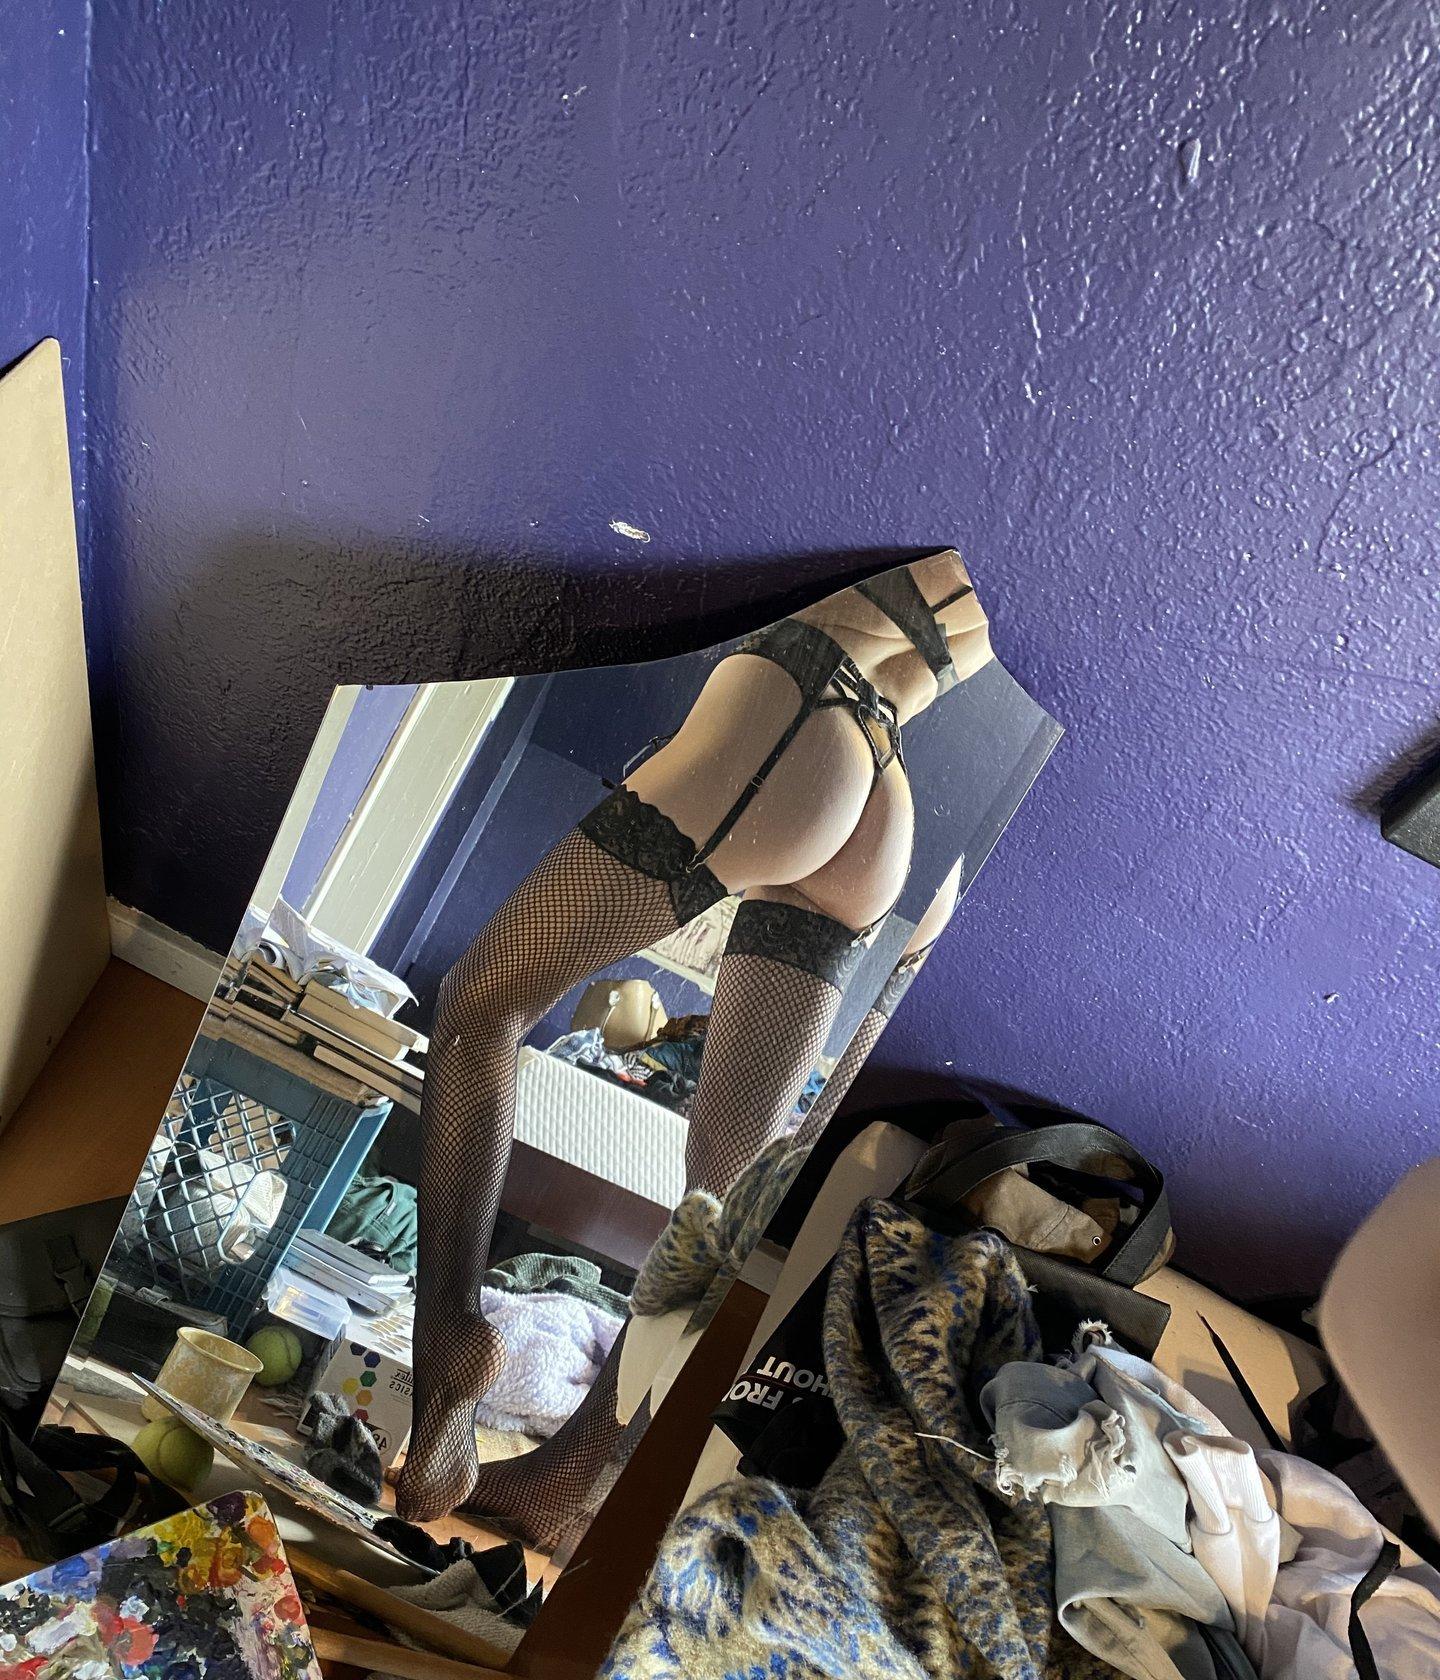 Phia Phiasco Onlyfans Sexy Leaks 0017